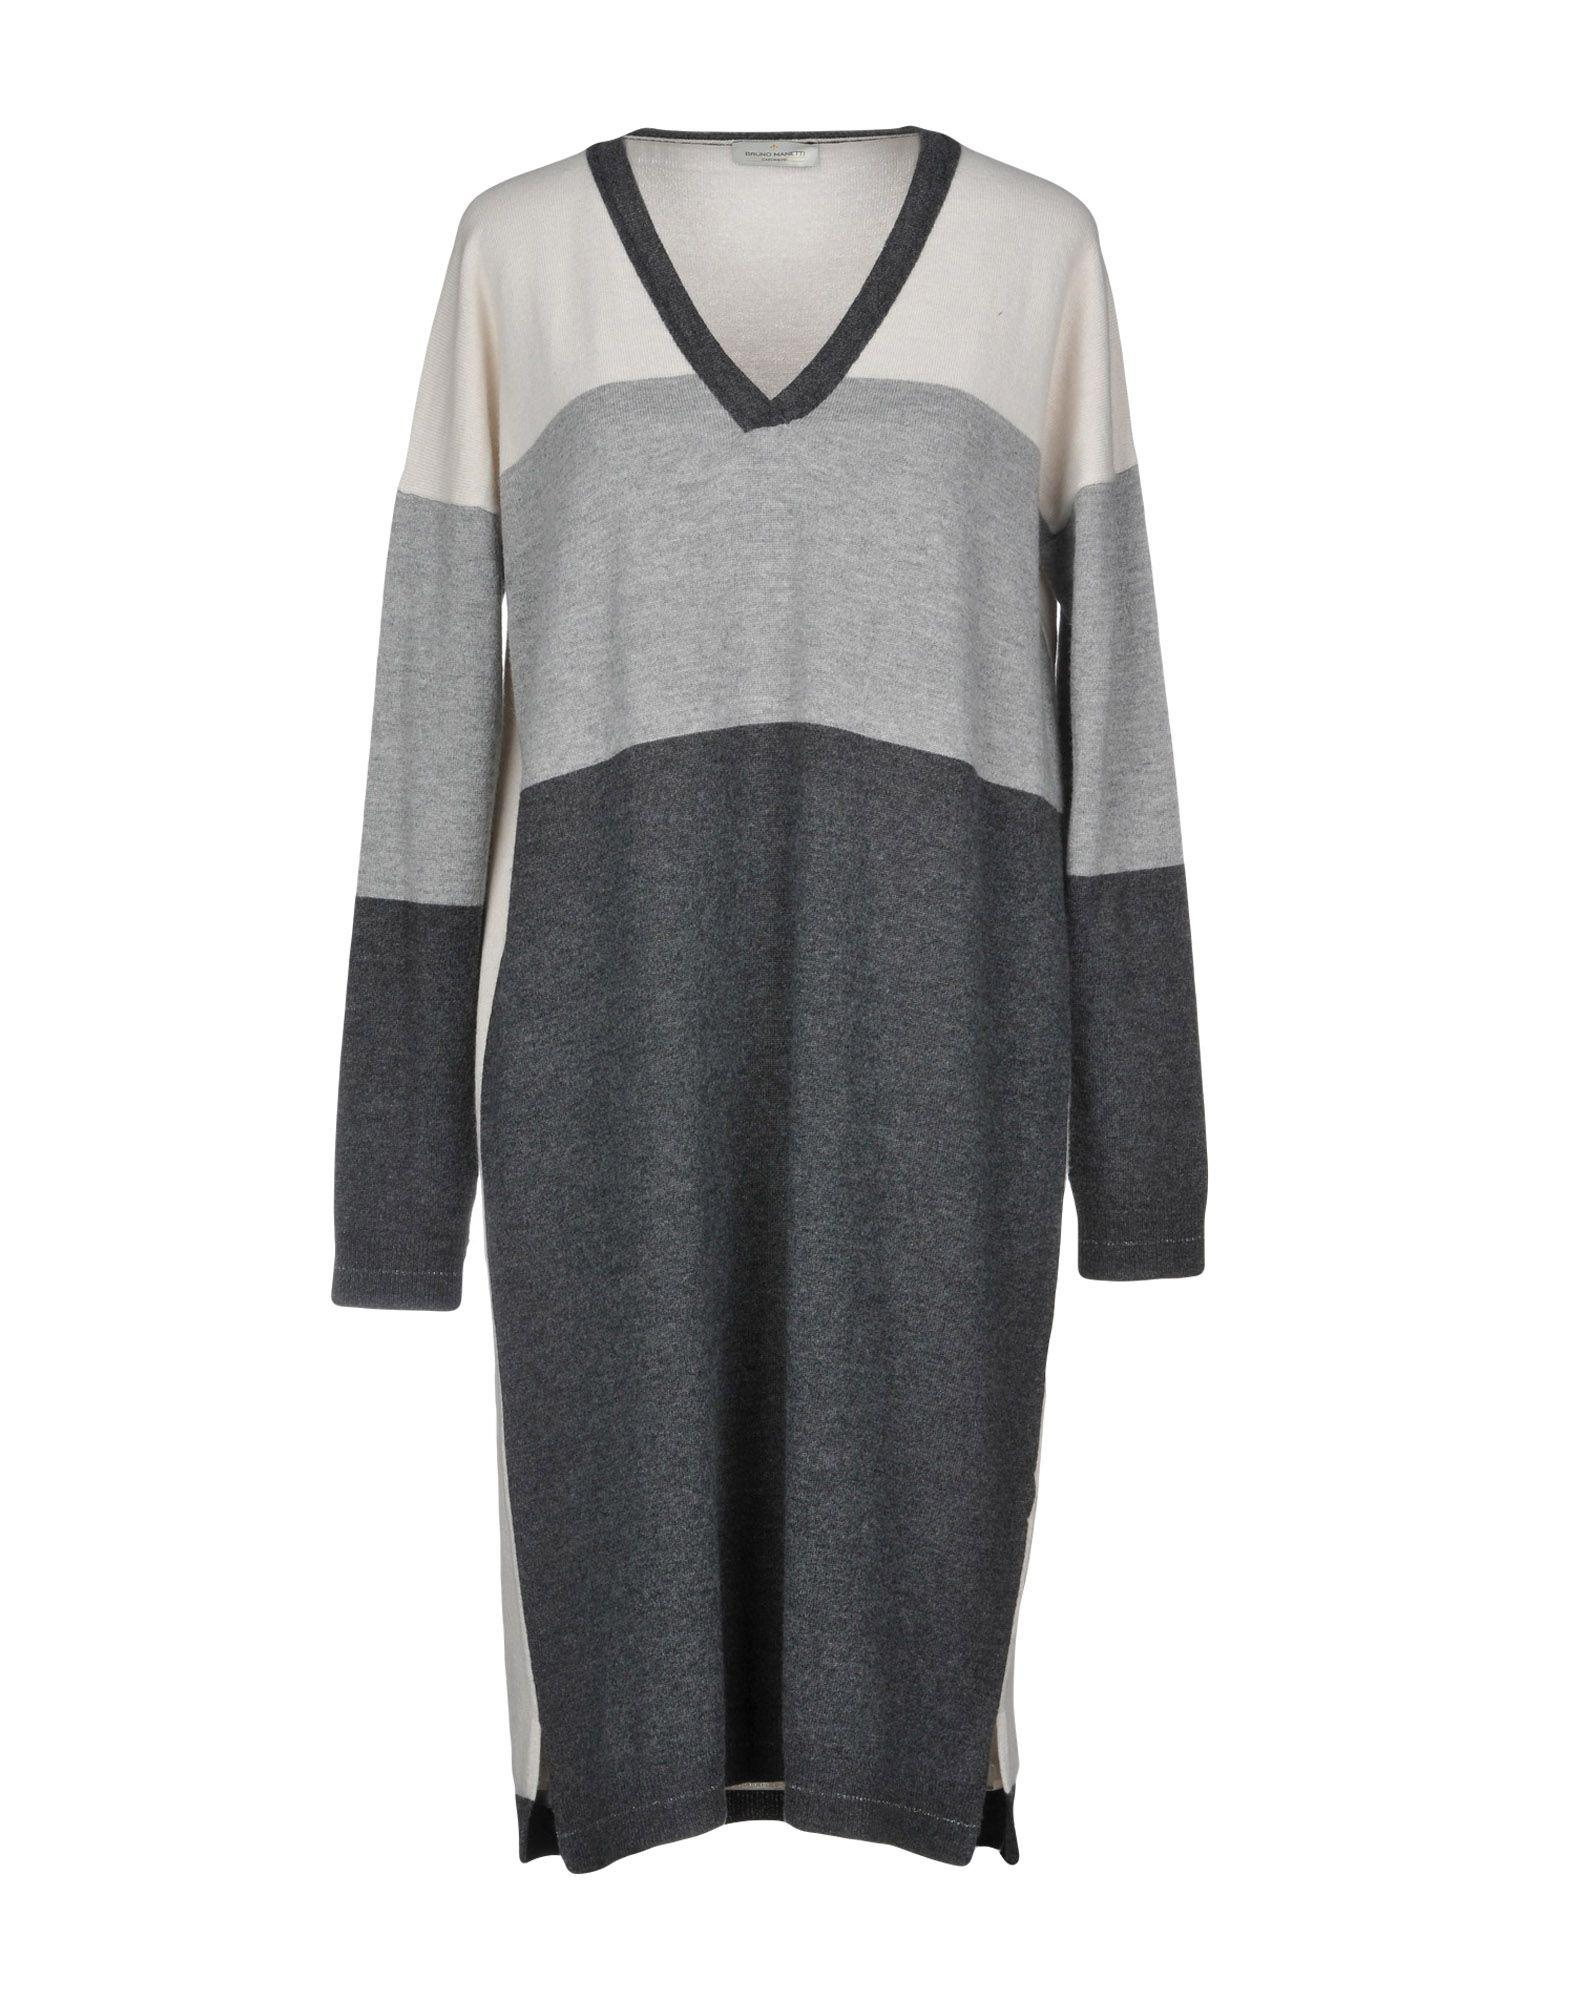 DRESSES - Knee-length dresses Bruno Manetti Clearance Marketable Buy Online Cheap tLYBQ